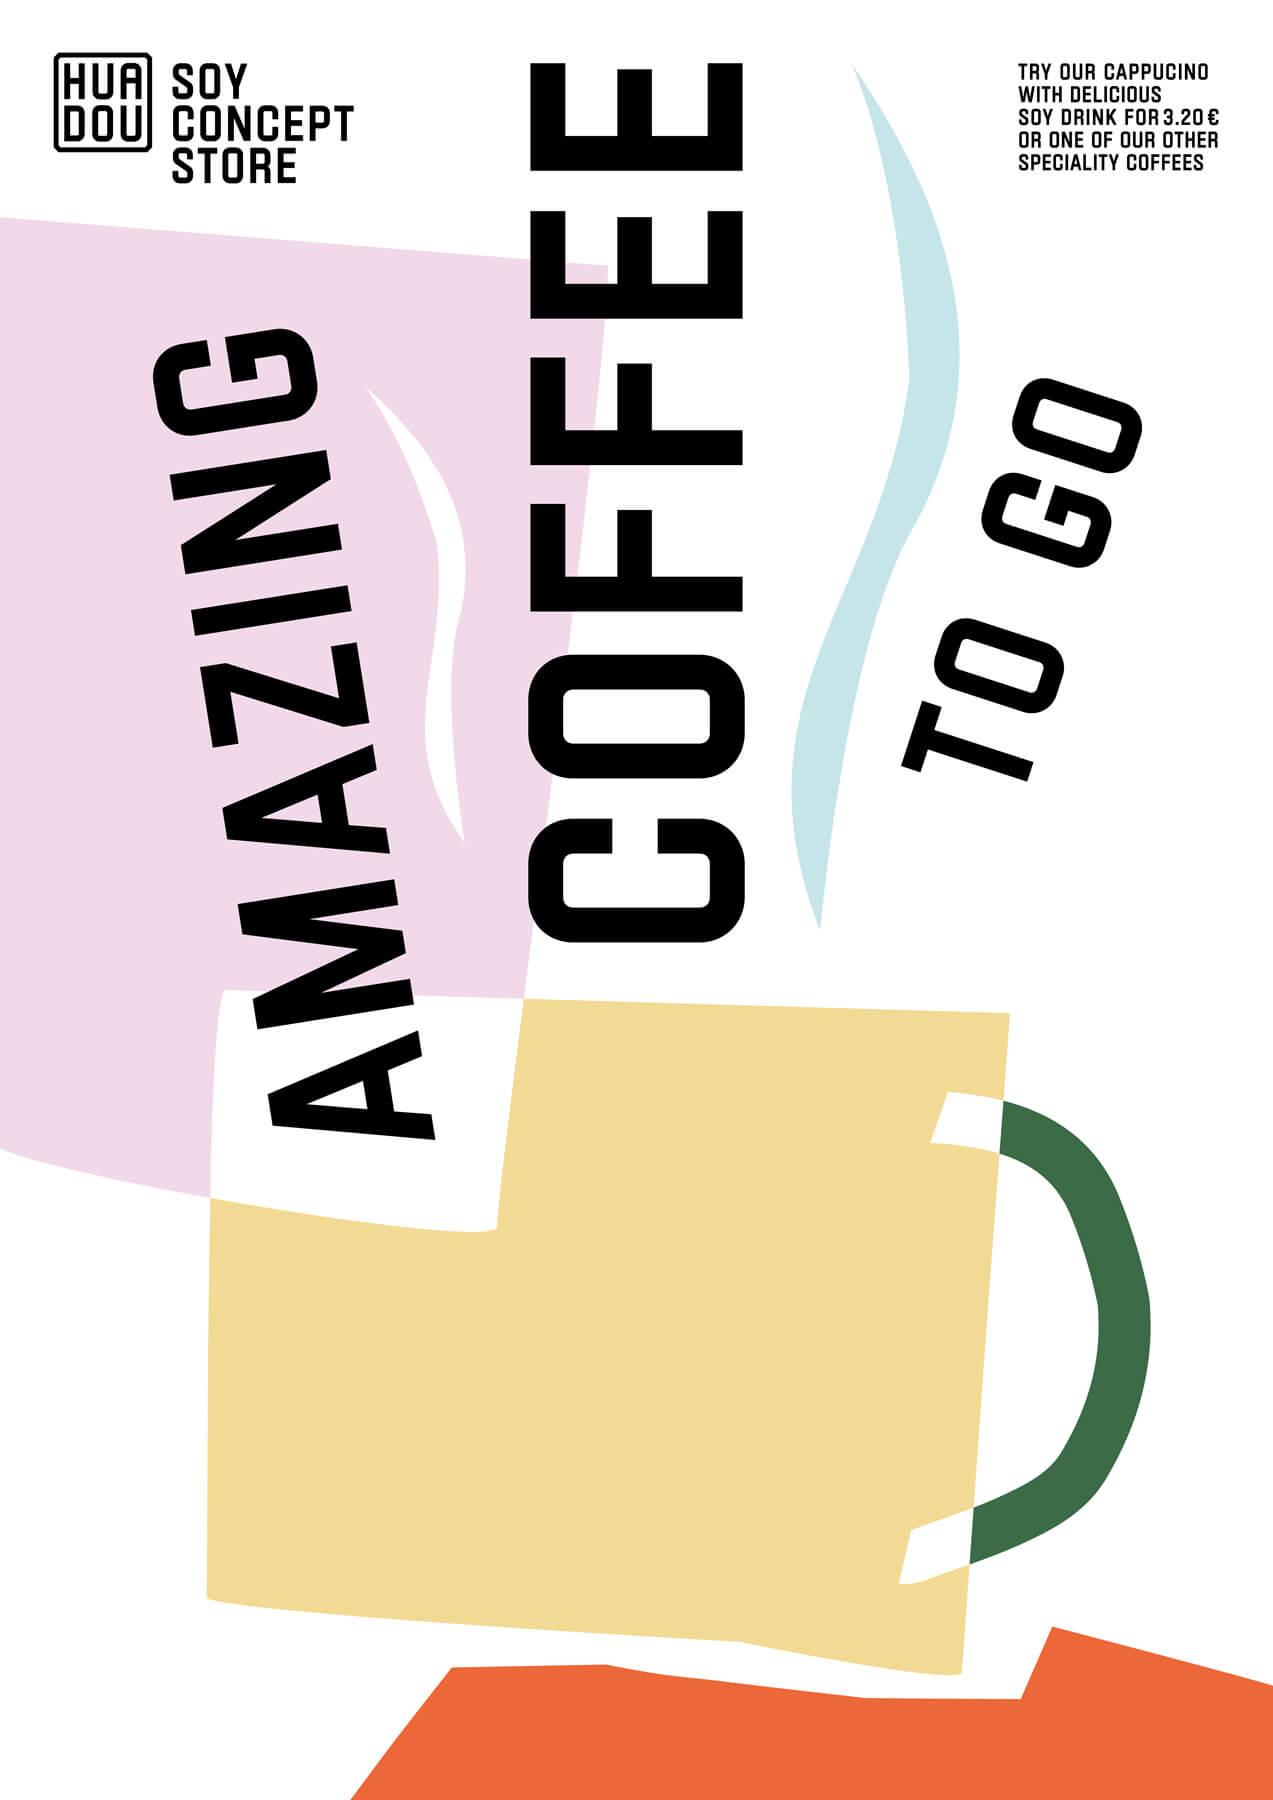 HUADOU-Plakat-Kaffee-01-lo